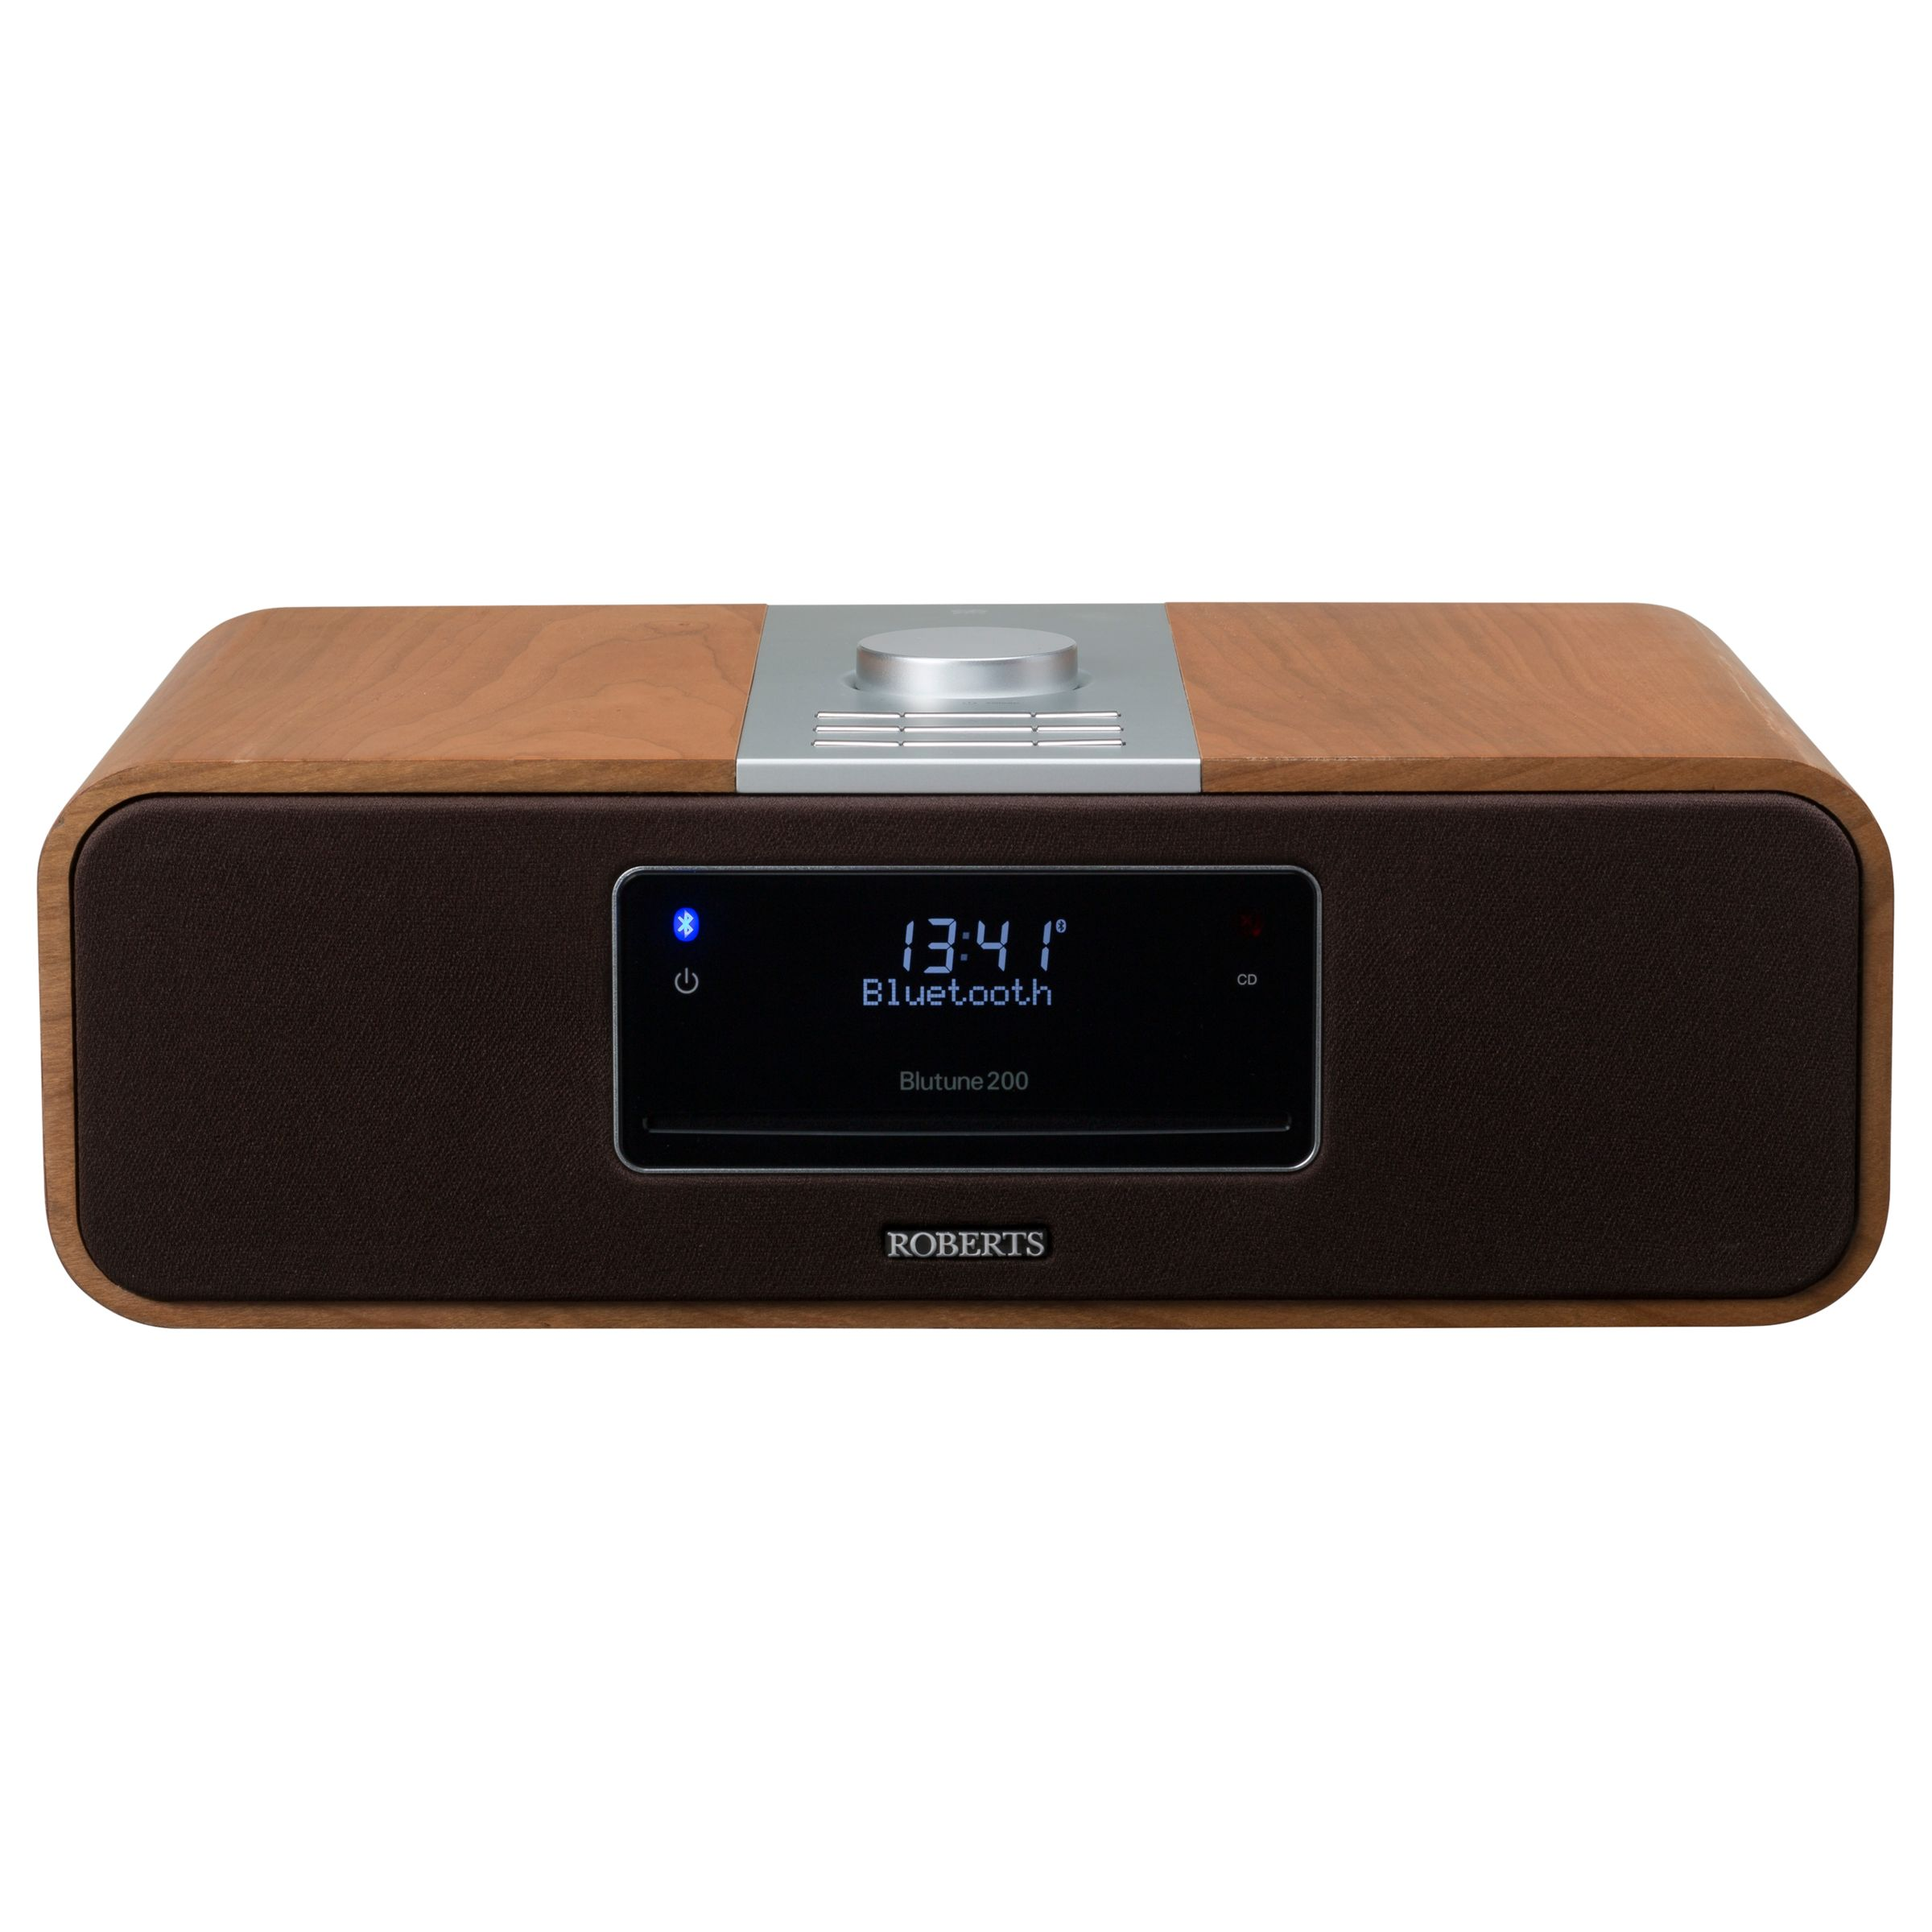 Roberts ROBERTS Blutune 200 DAB/FM/CD Bluetooth Radio